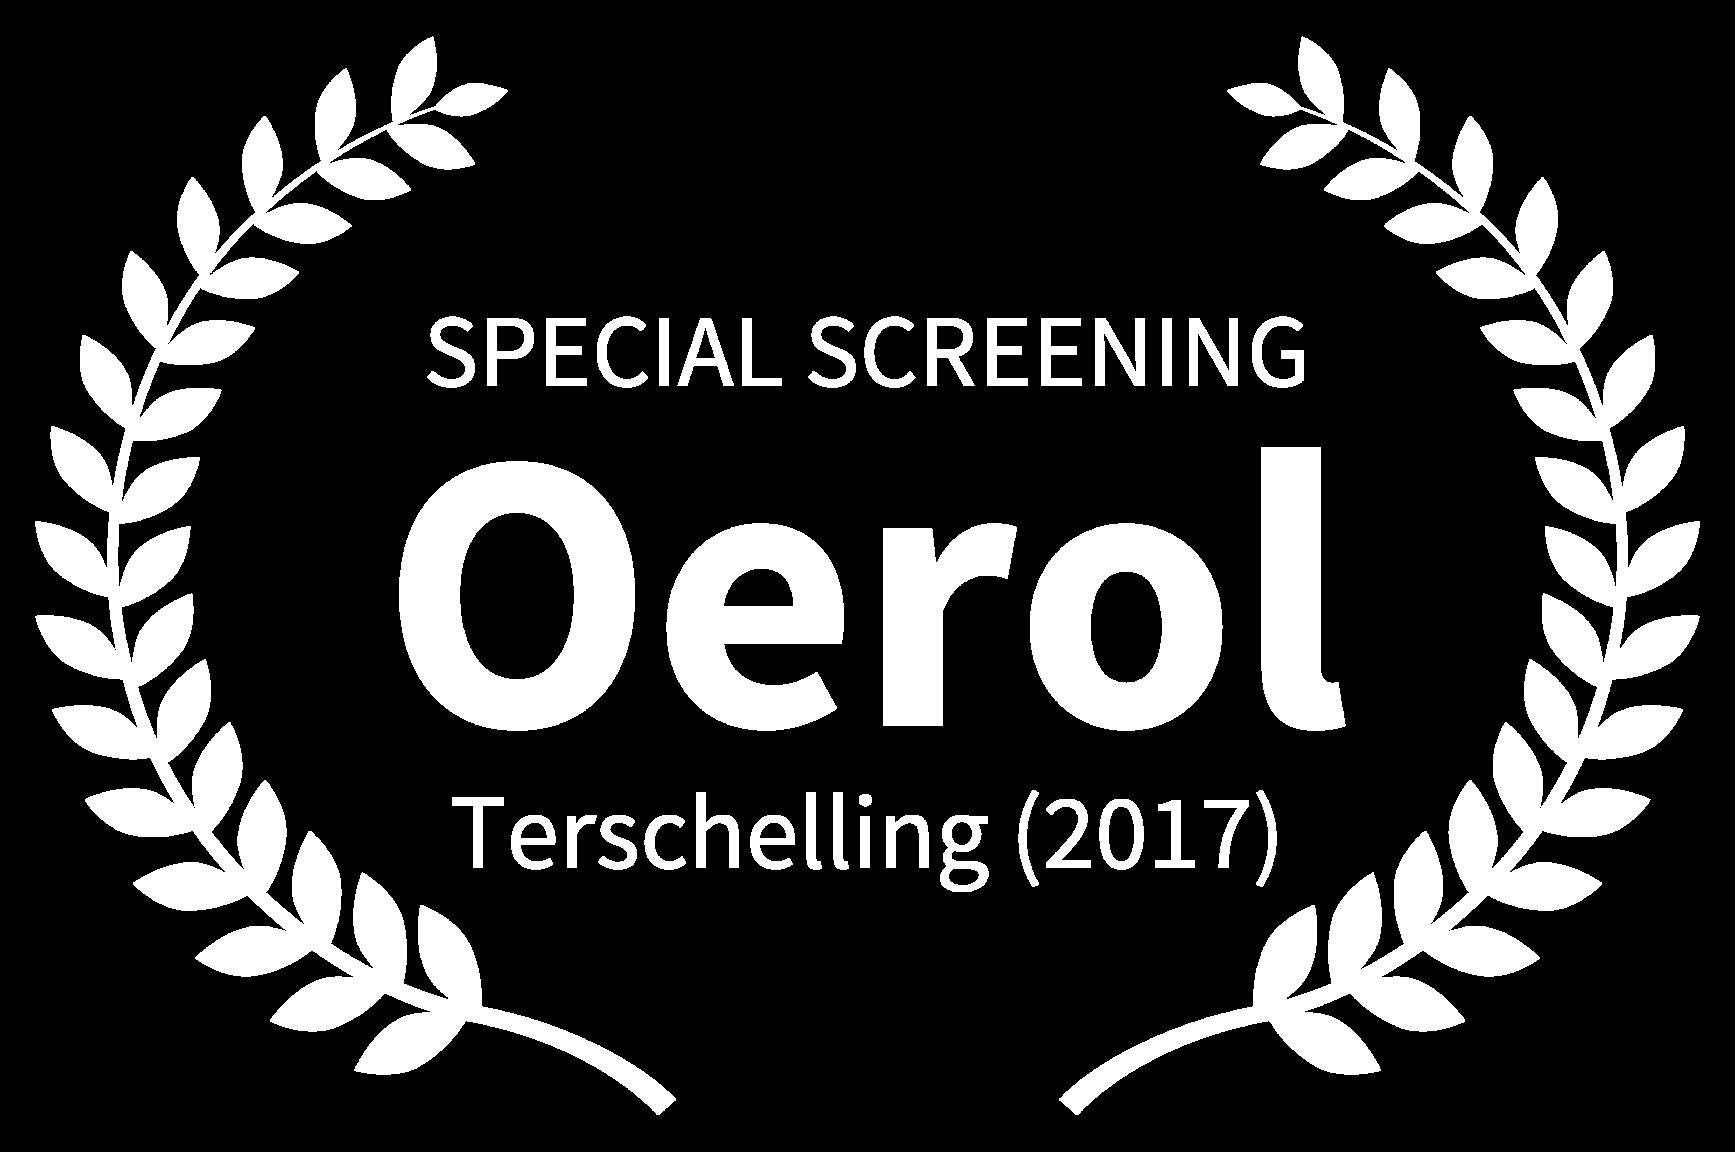 SPECIAL SCREENING - Oerol - Terschelling 2017